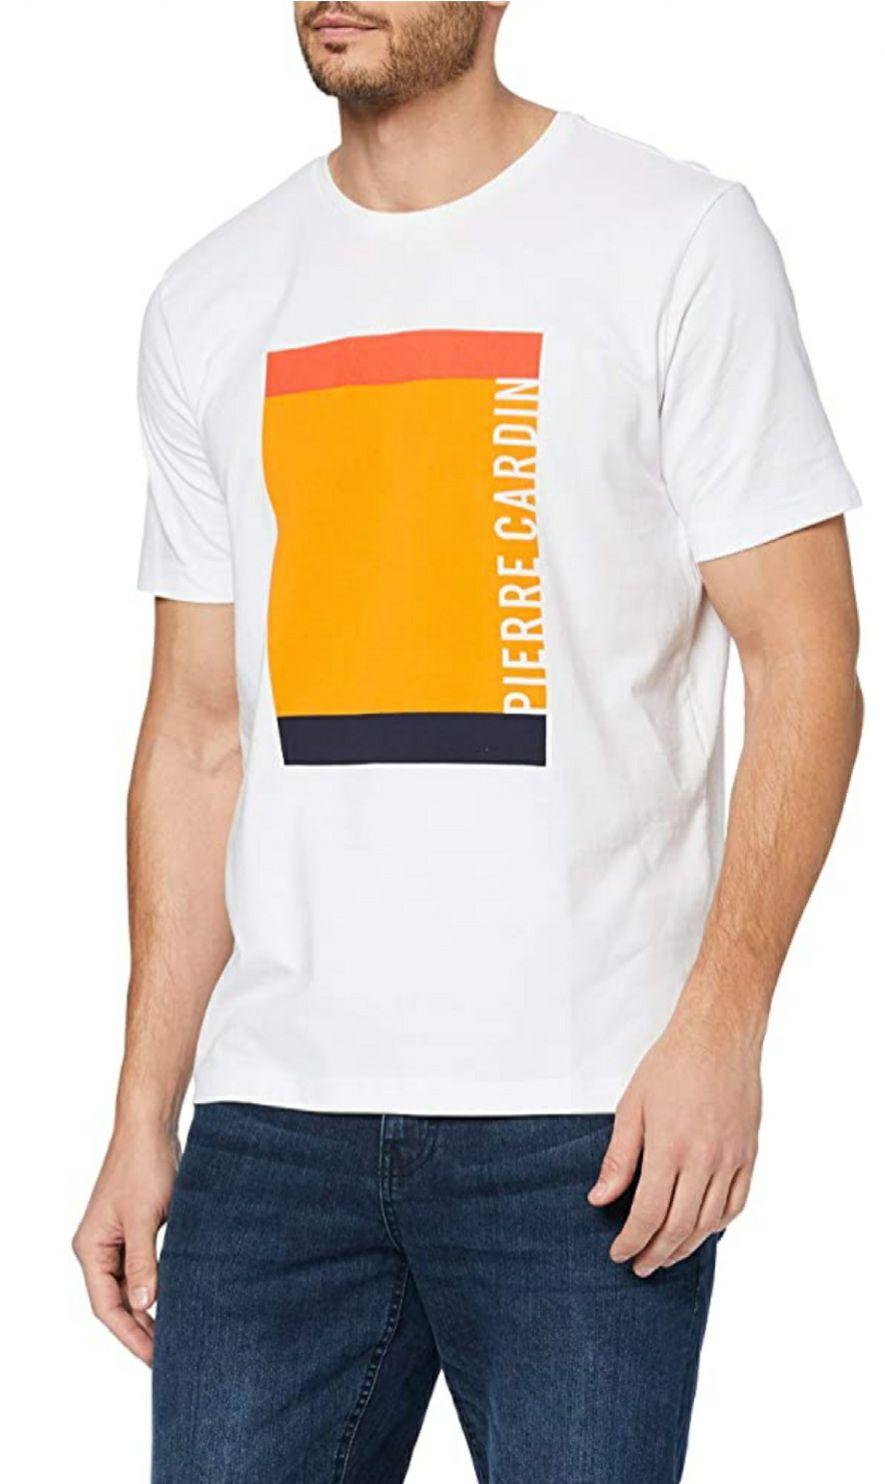 Camiseta Pierre Cardin (Talla L)